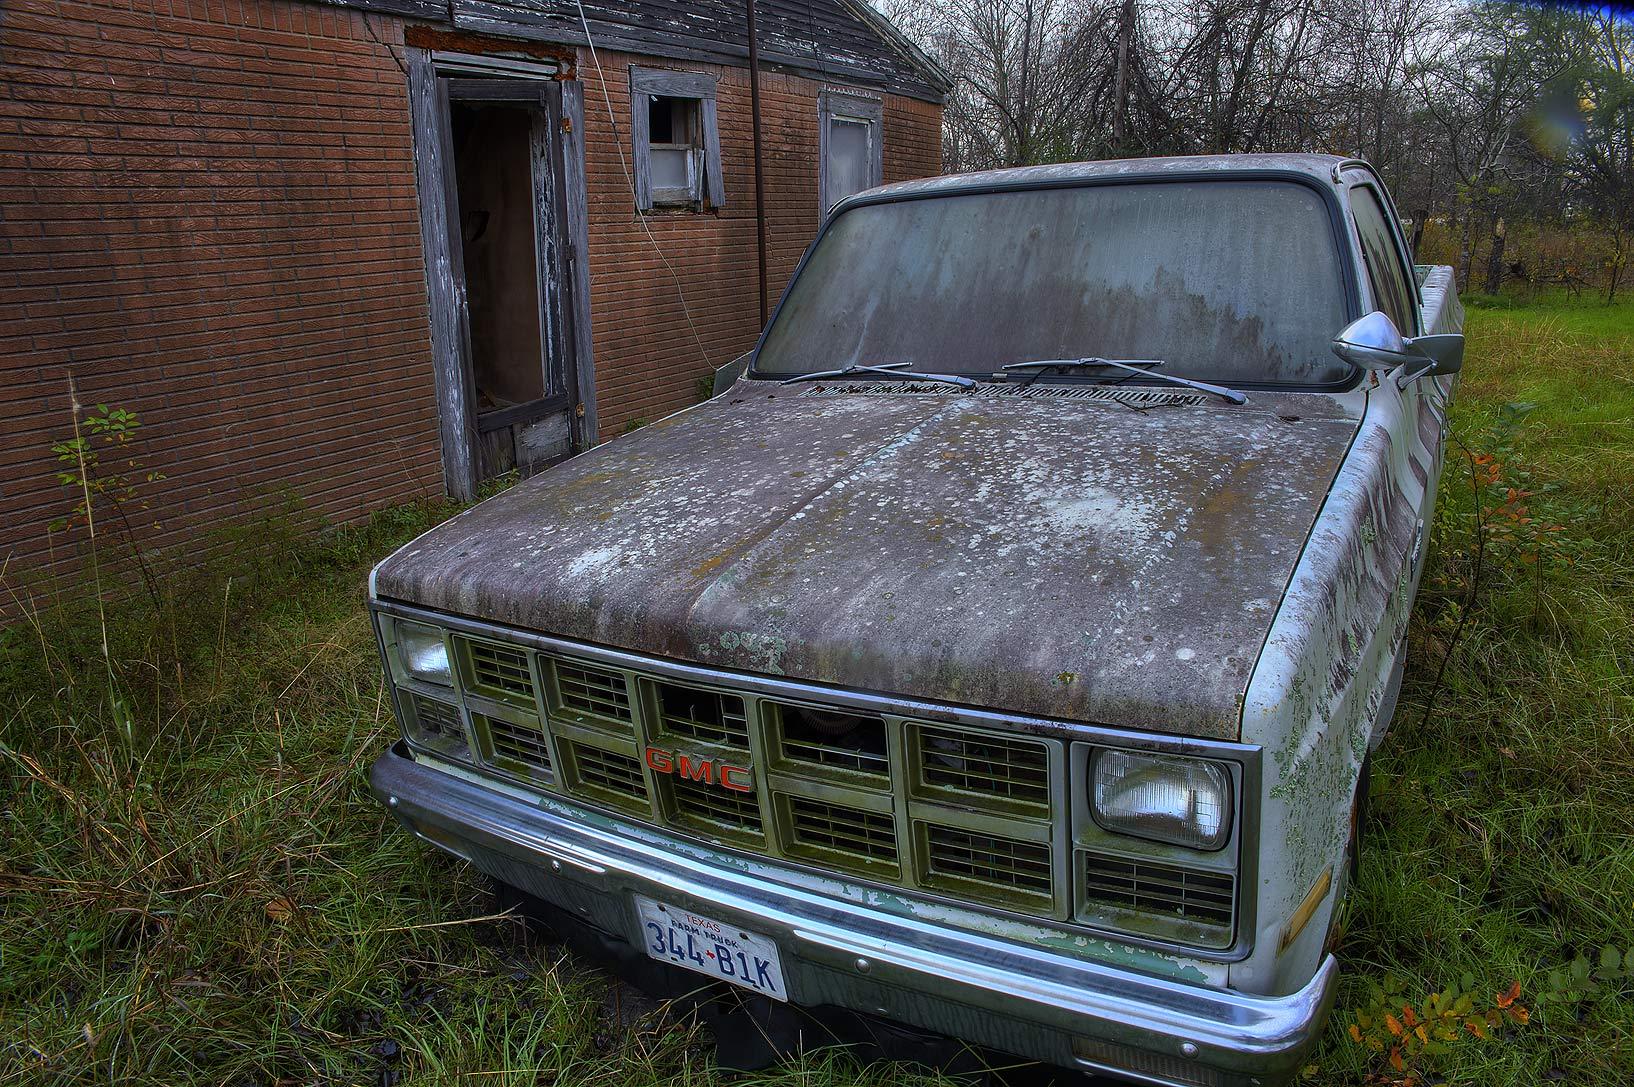 Photo 1315-28: Old GMC car near Rd. FM 39. North Zulch, Texas